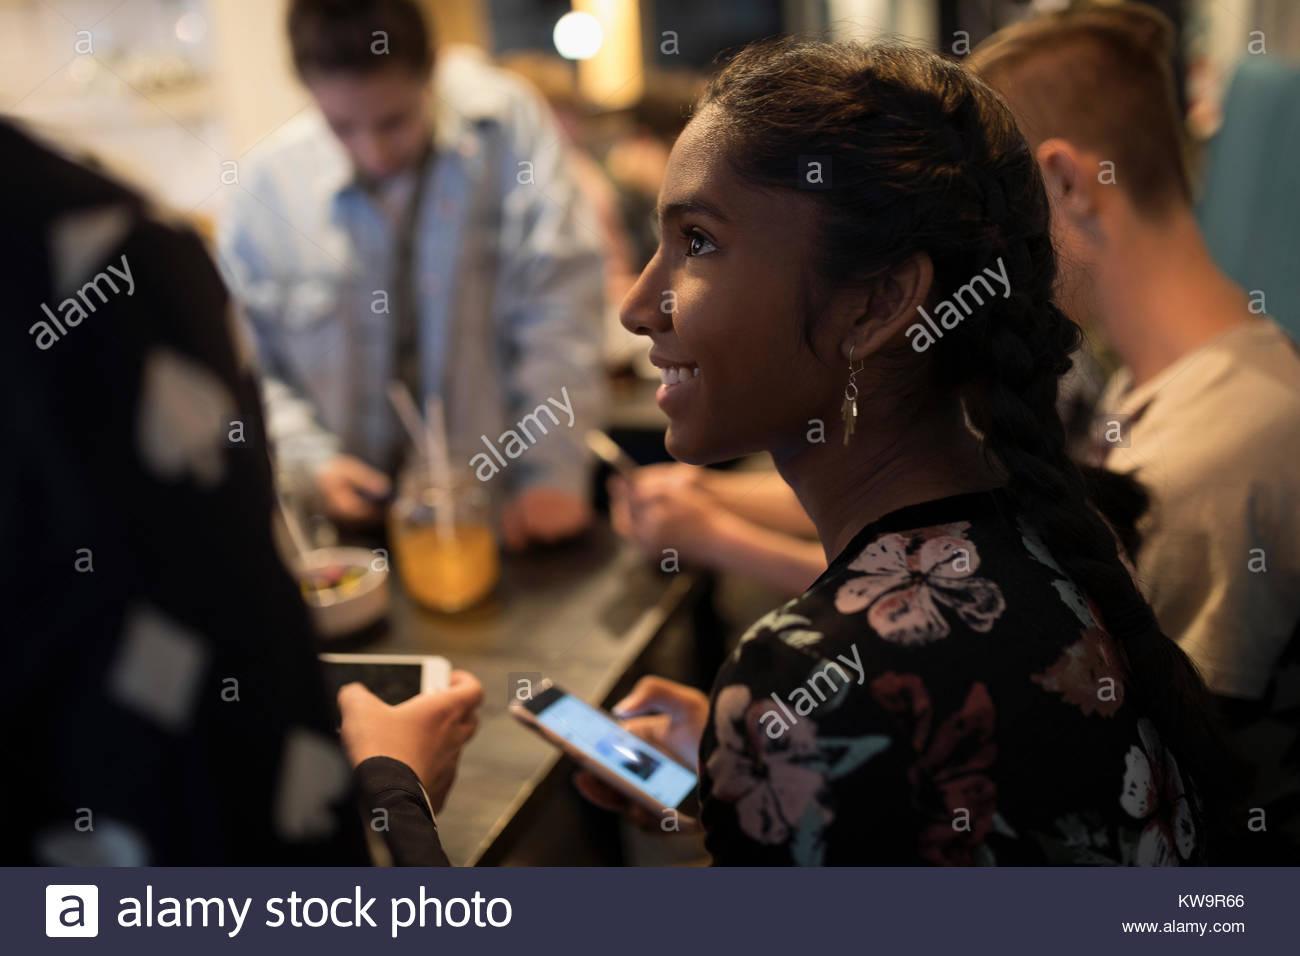 Interpolación indio sonriente chica texto con teléfono inteligente,colgando en la mesita de café Imagen De Stock